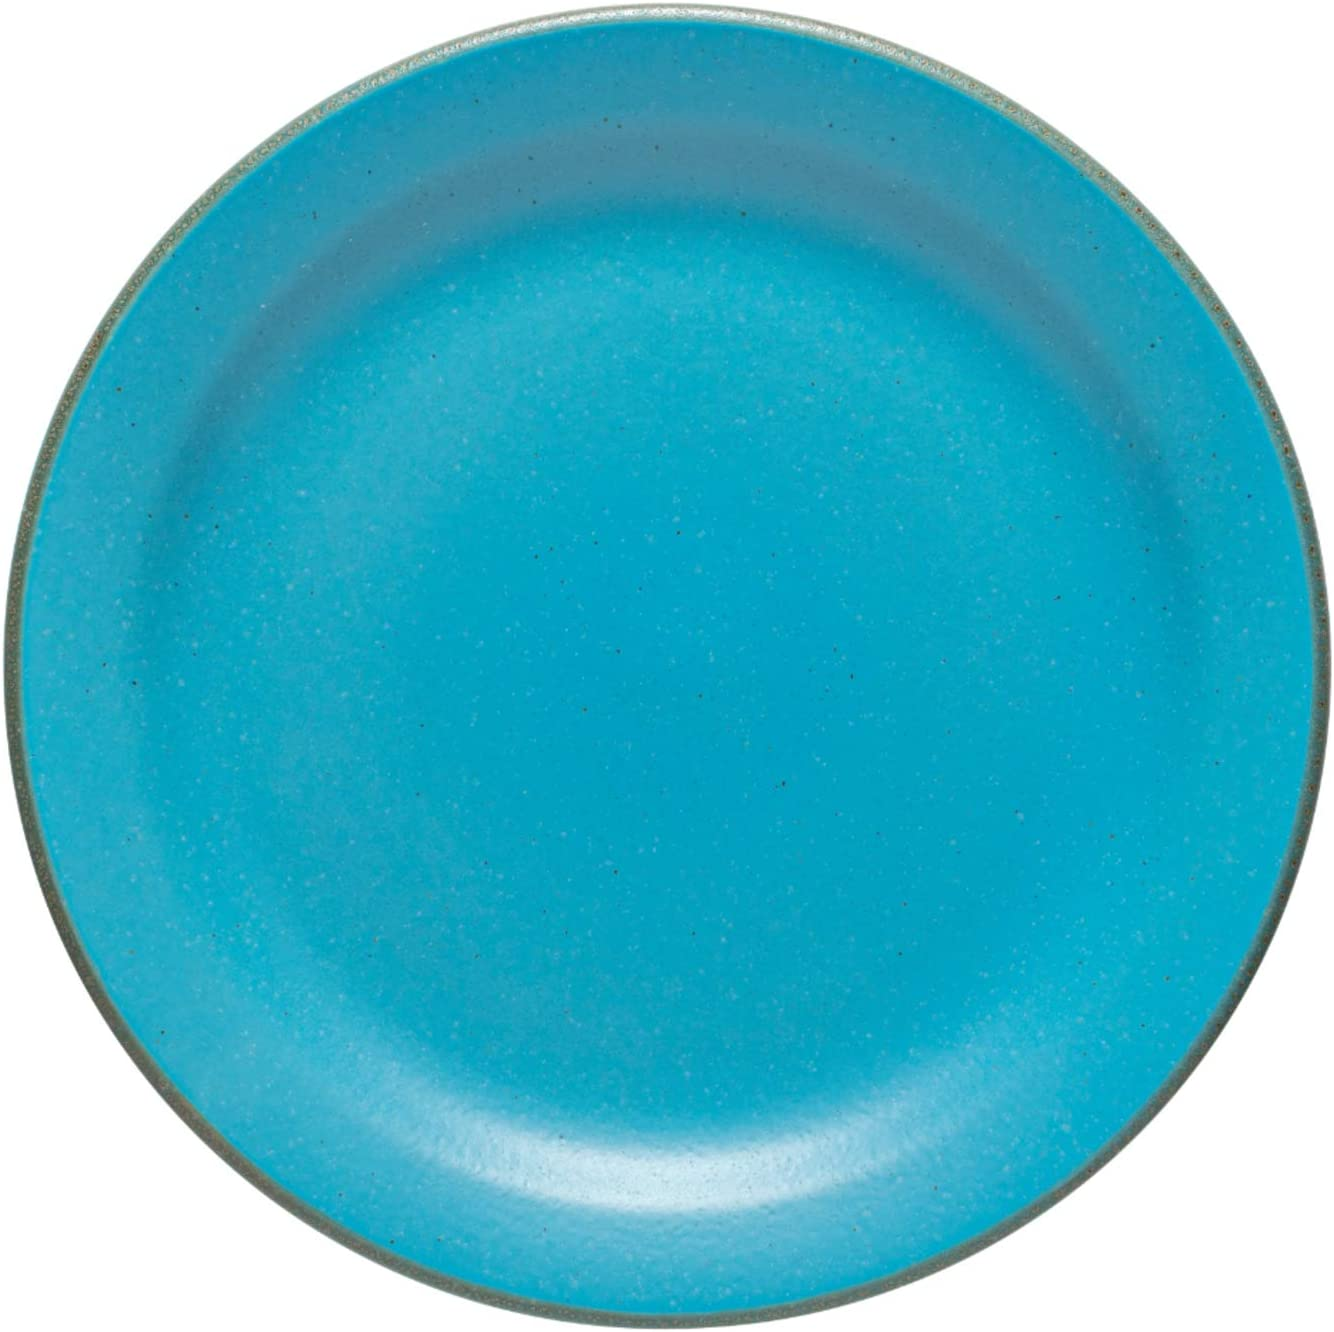 Casafina Positano Collection Houston Mall Stoneware Dinner Plate 11